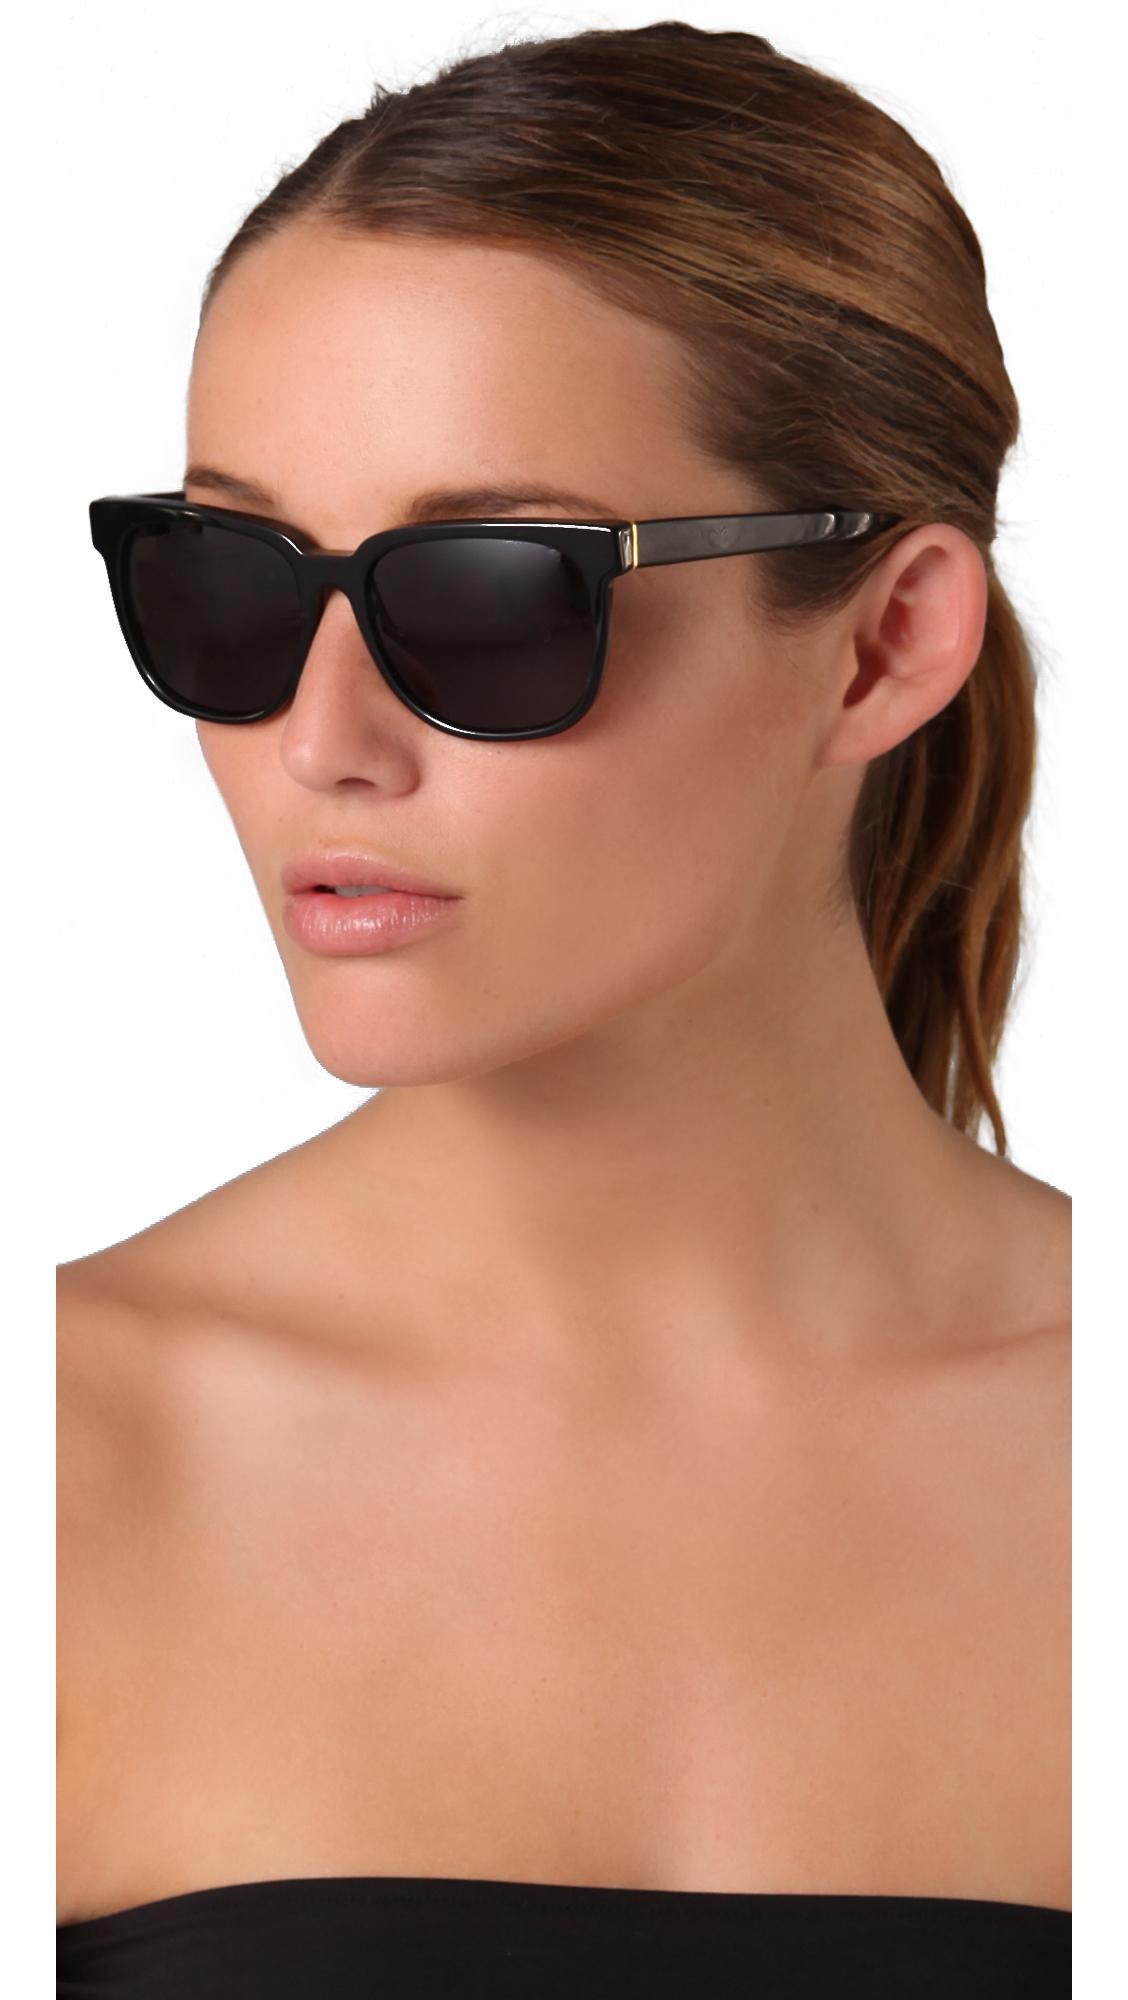 Lyst Retrosuperfuture People Sunglasses In Black